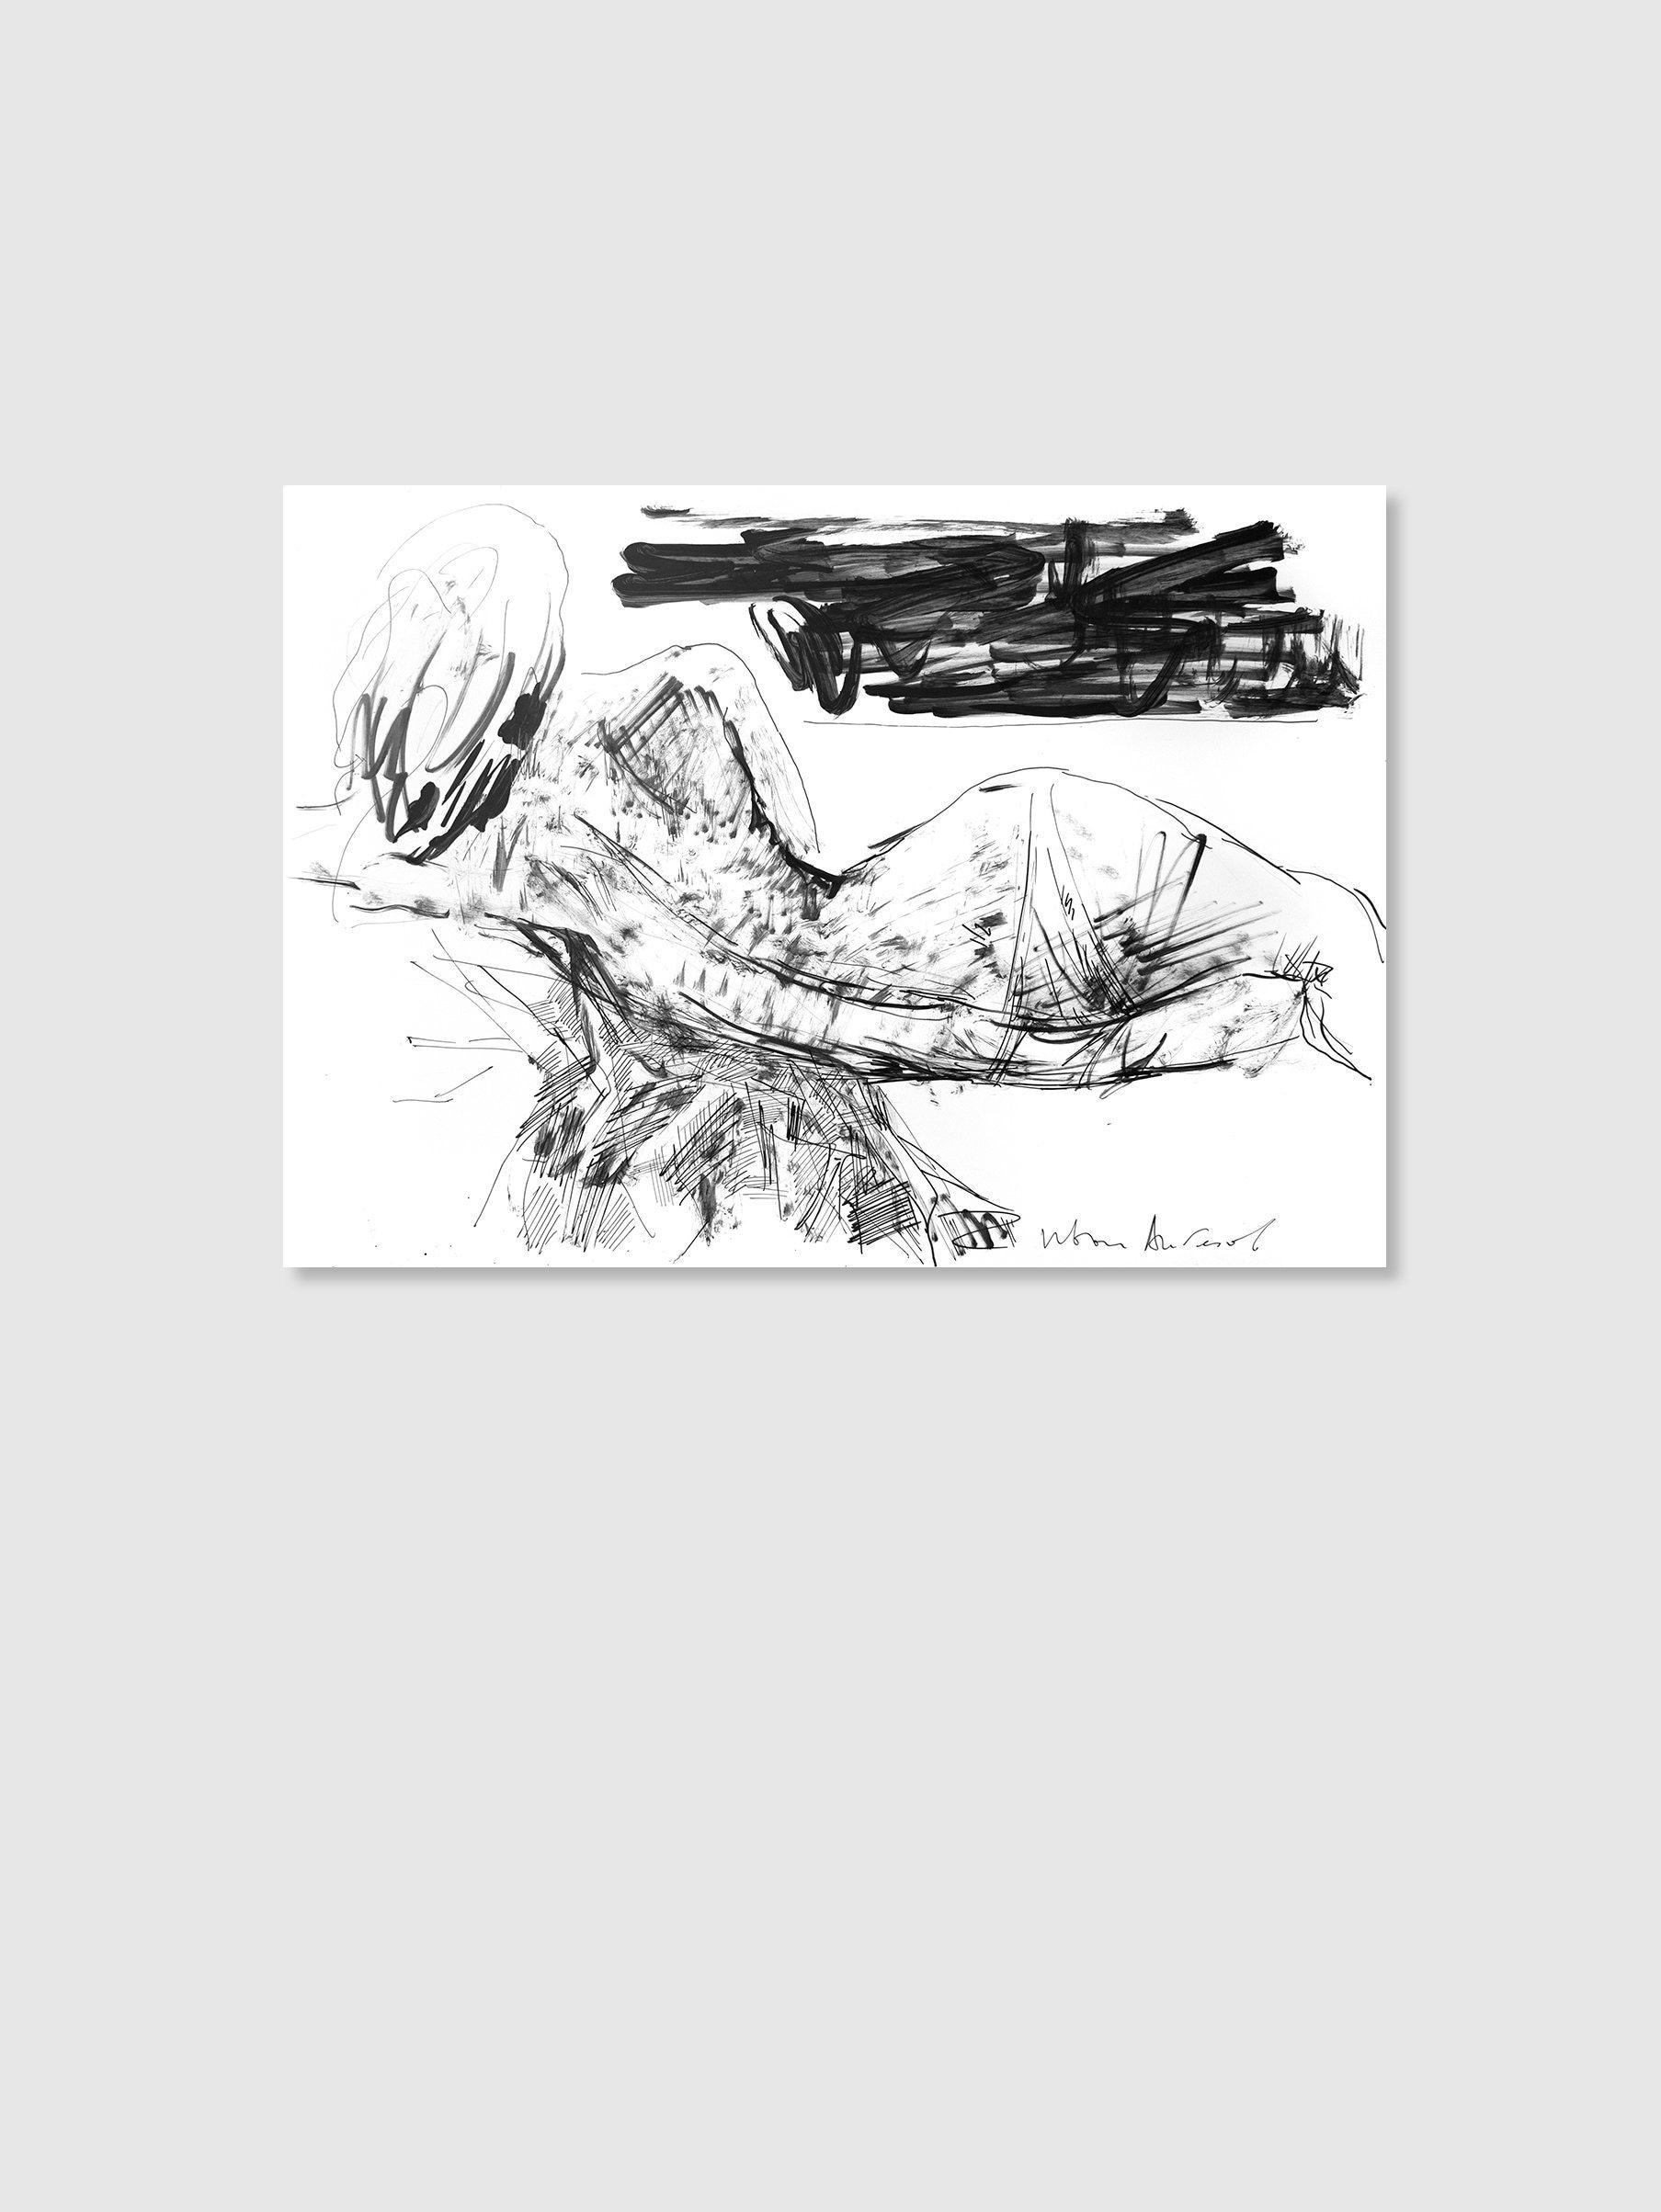 Nude Ink Abstract Painting Minimal Black Wall Art - Kogan.com